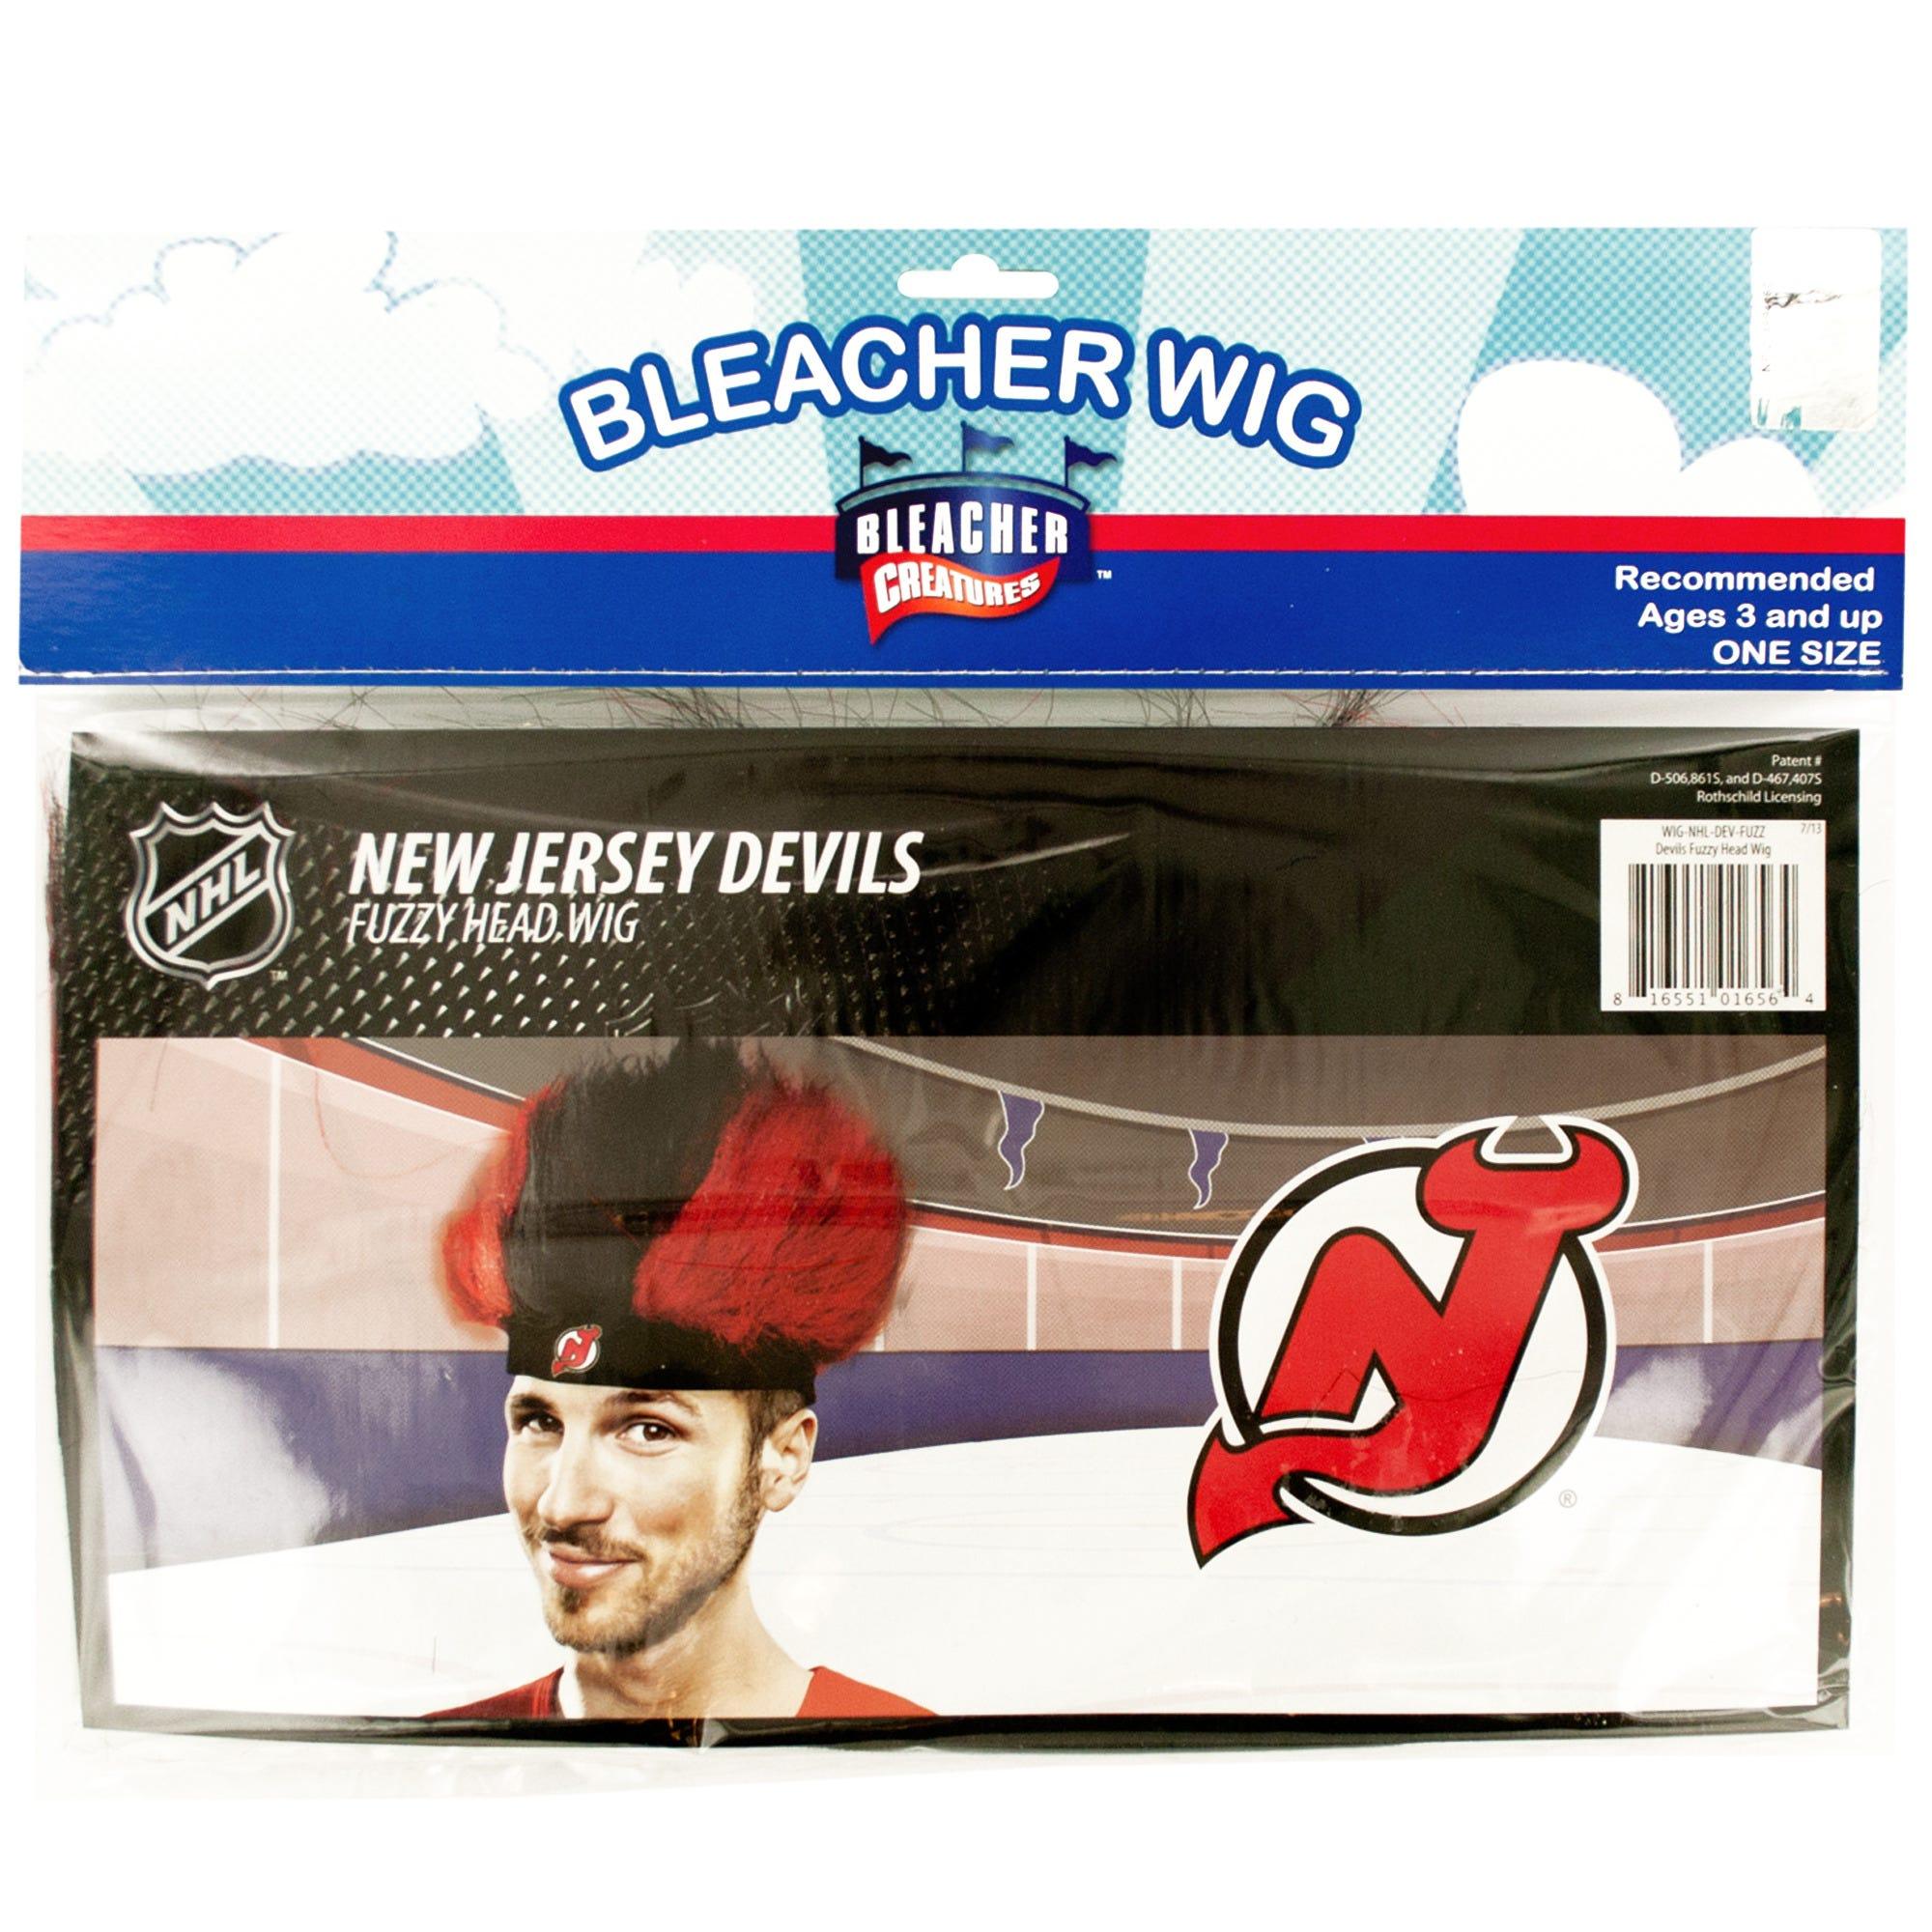 NEW Jersey Devils Fuzzy Head Wig- Qty 18